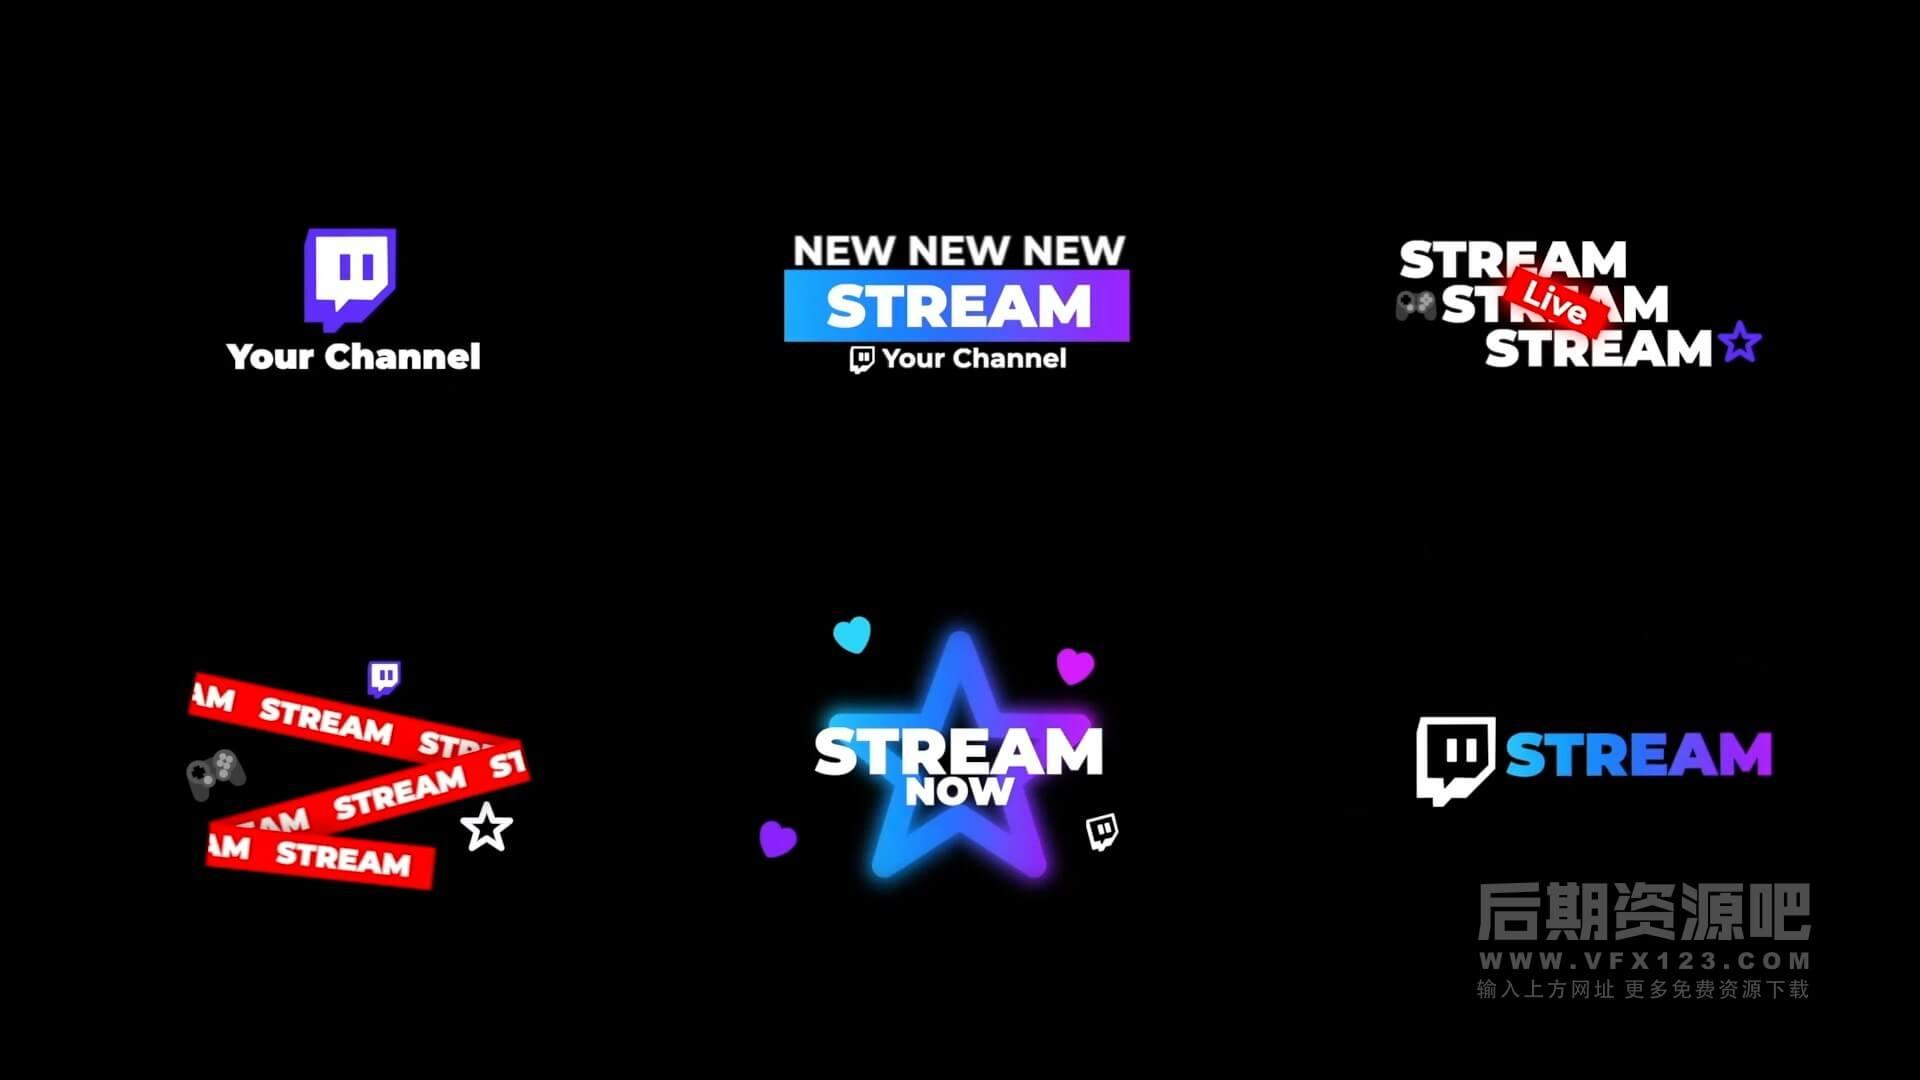 fcpx插件 游戏主播短视频制作素材包 支持竖屏 Gamers Pack